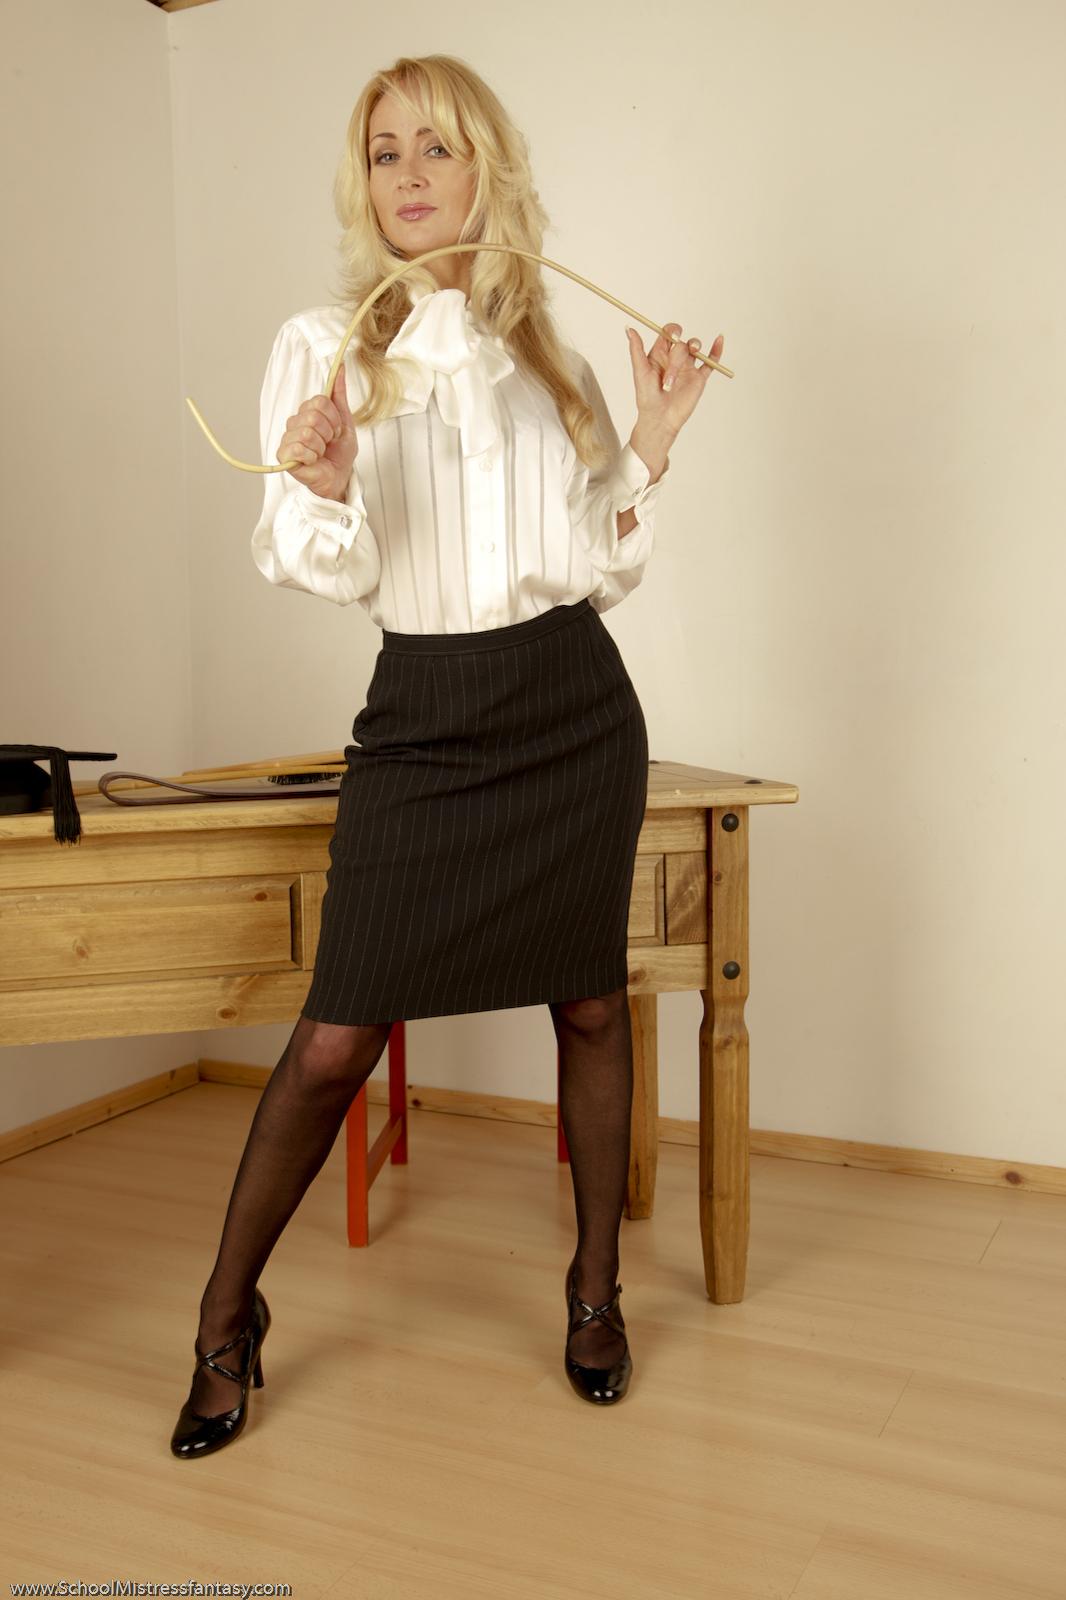 punishment in schools for women